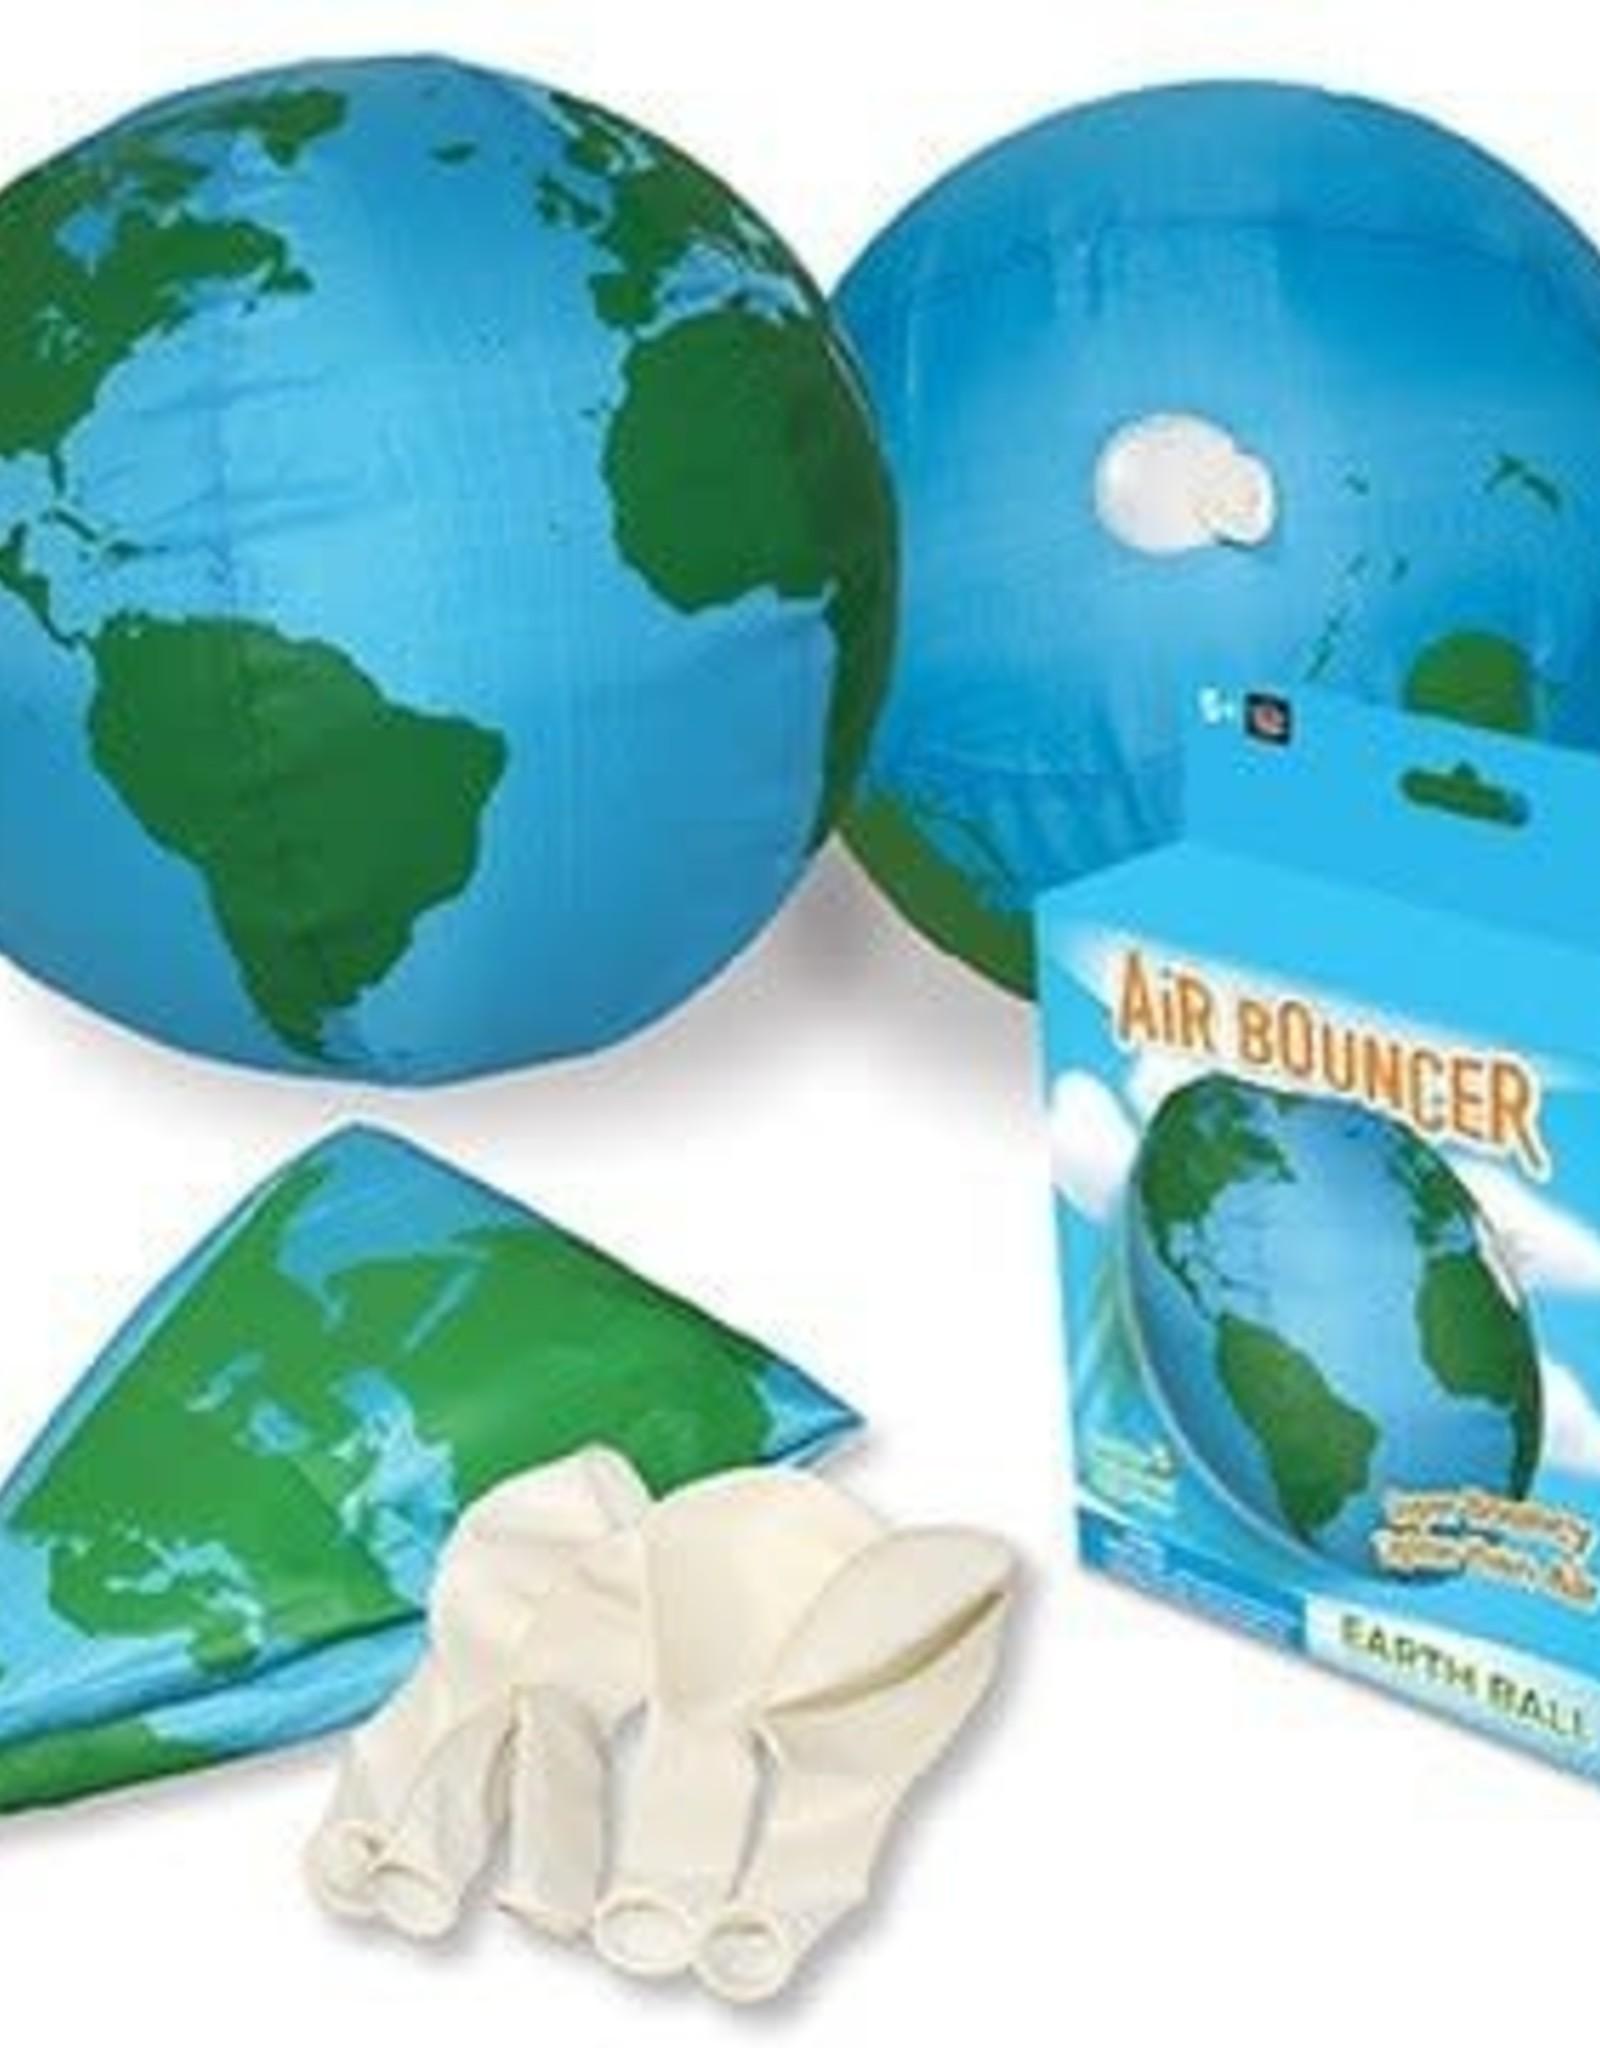 Play Visions Earth Air Bouncer